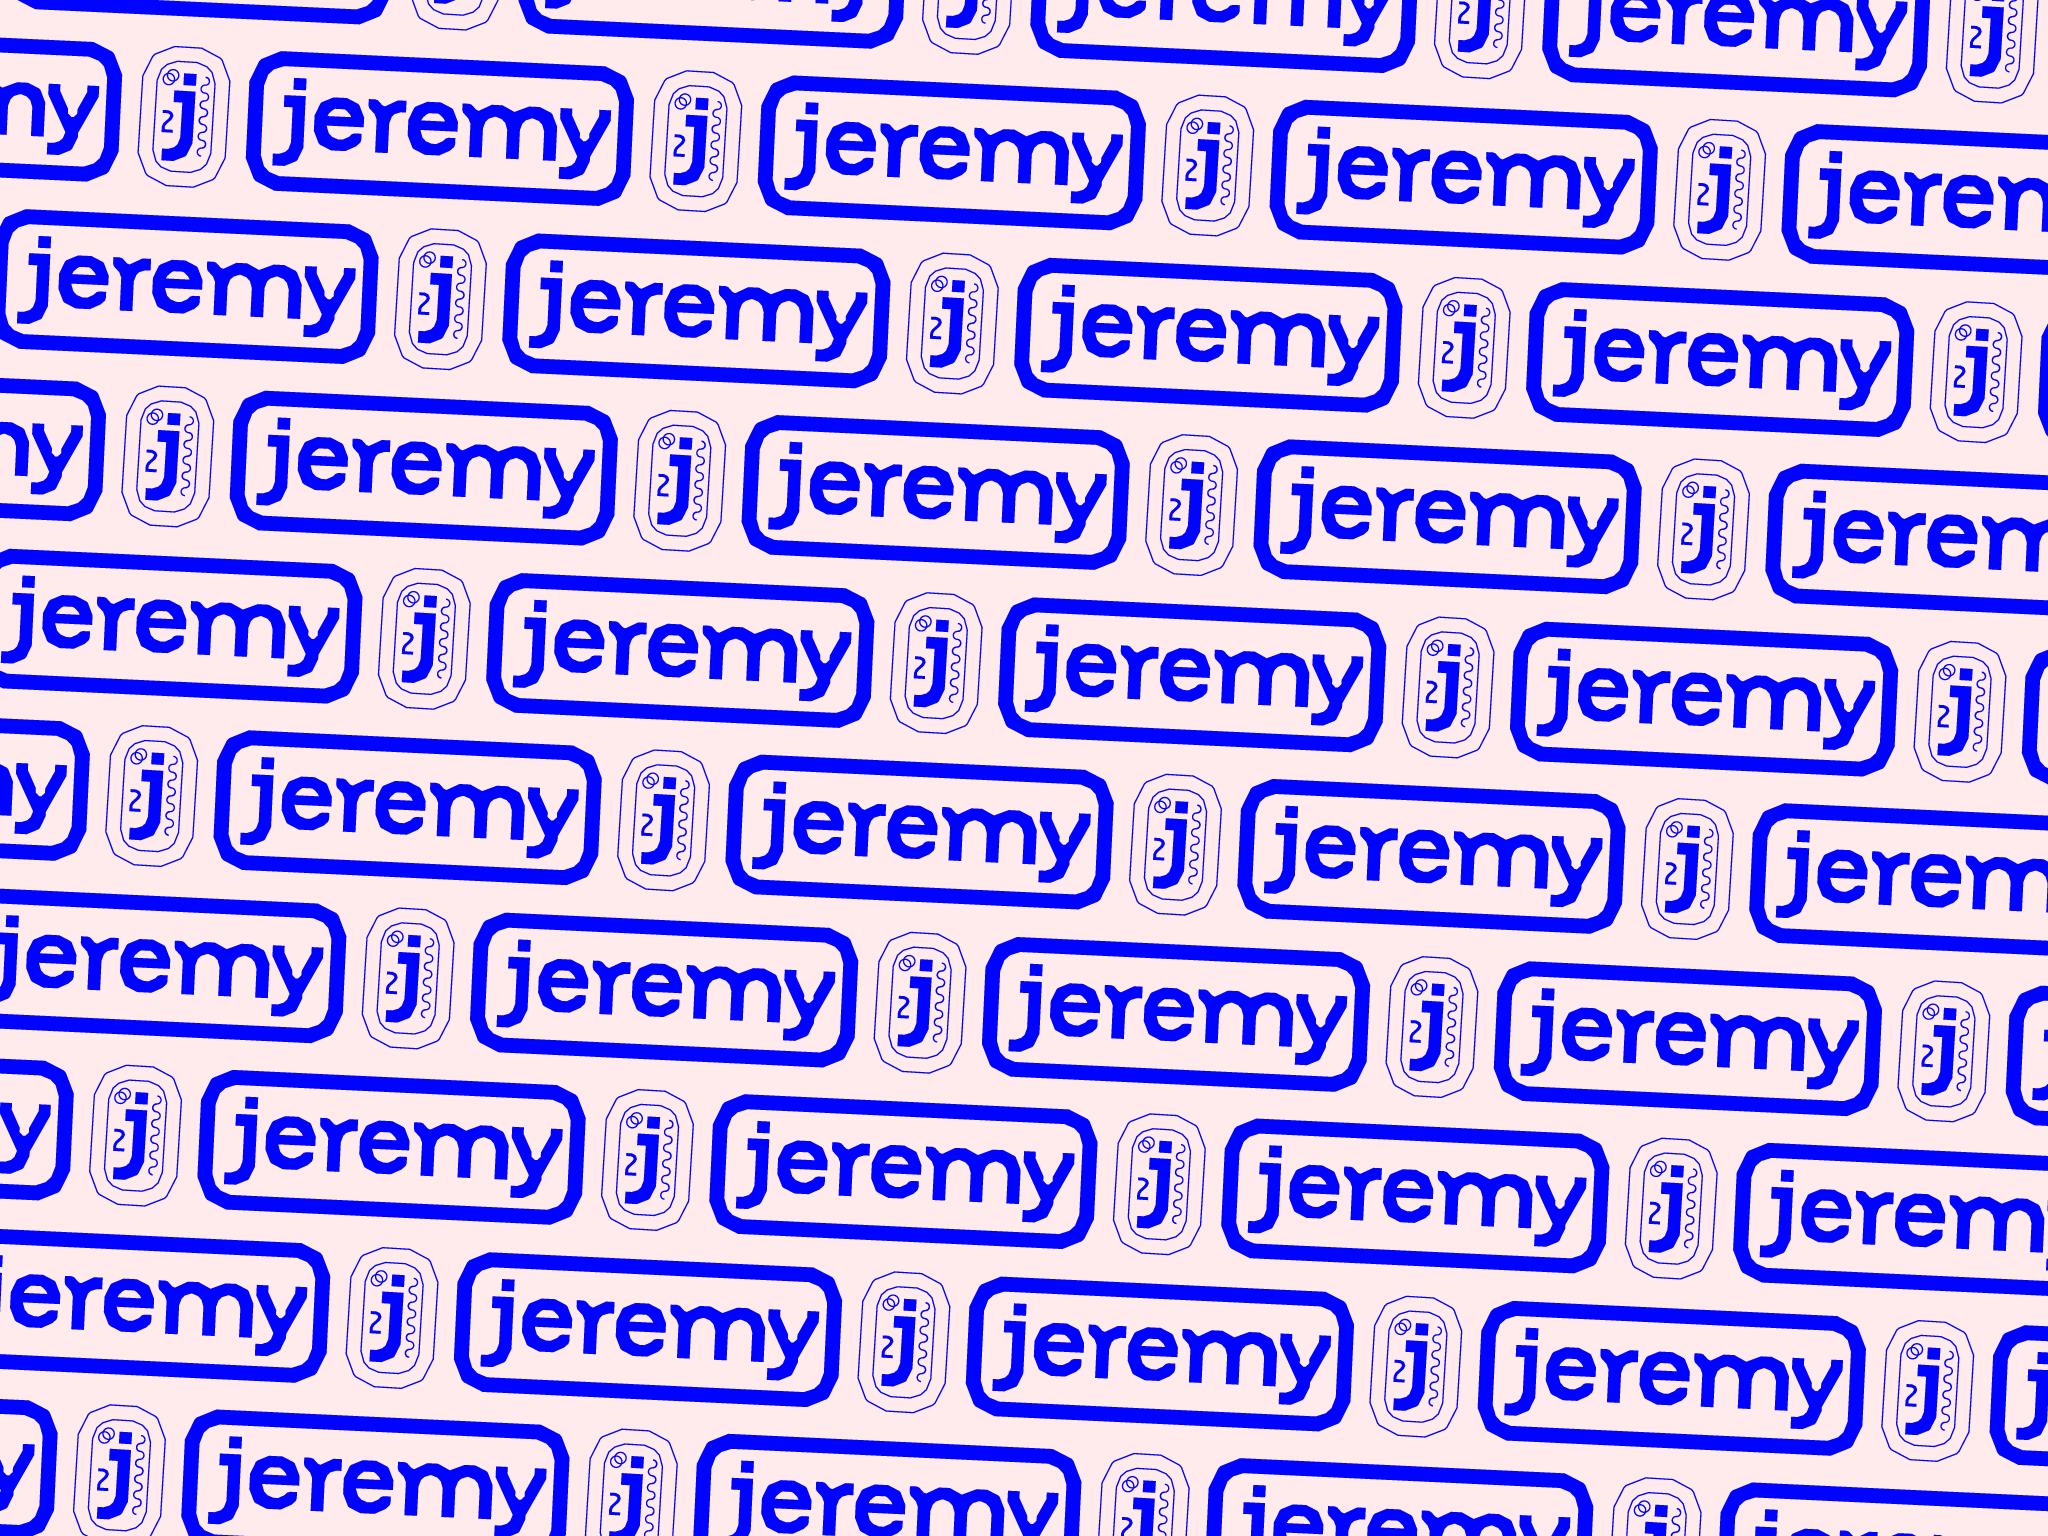 jeremy.tablet.png